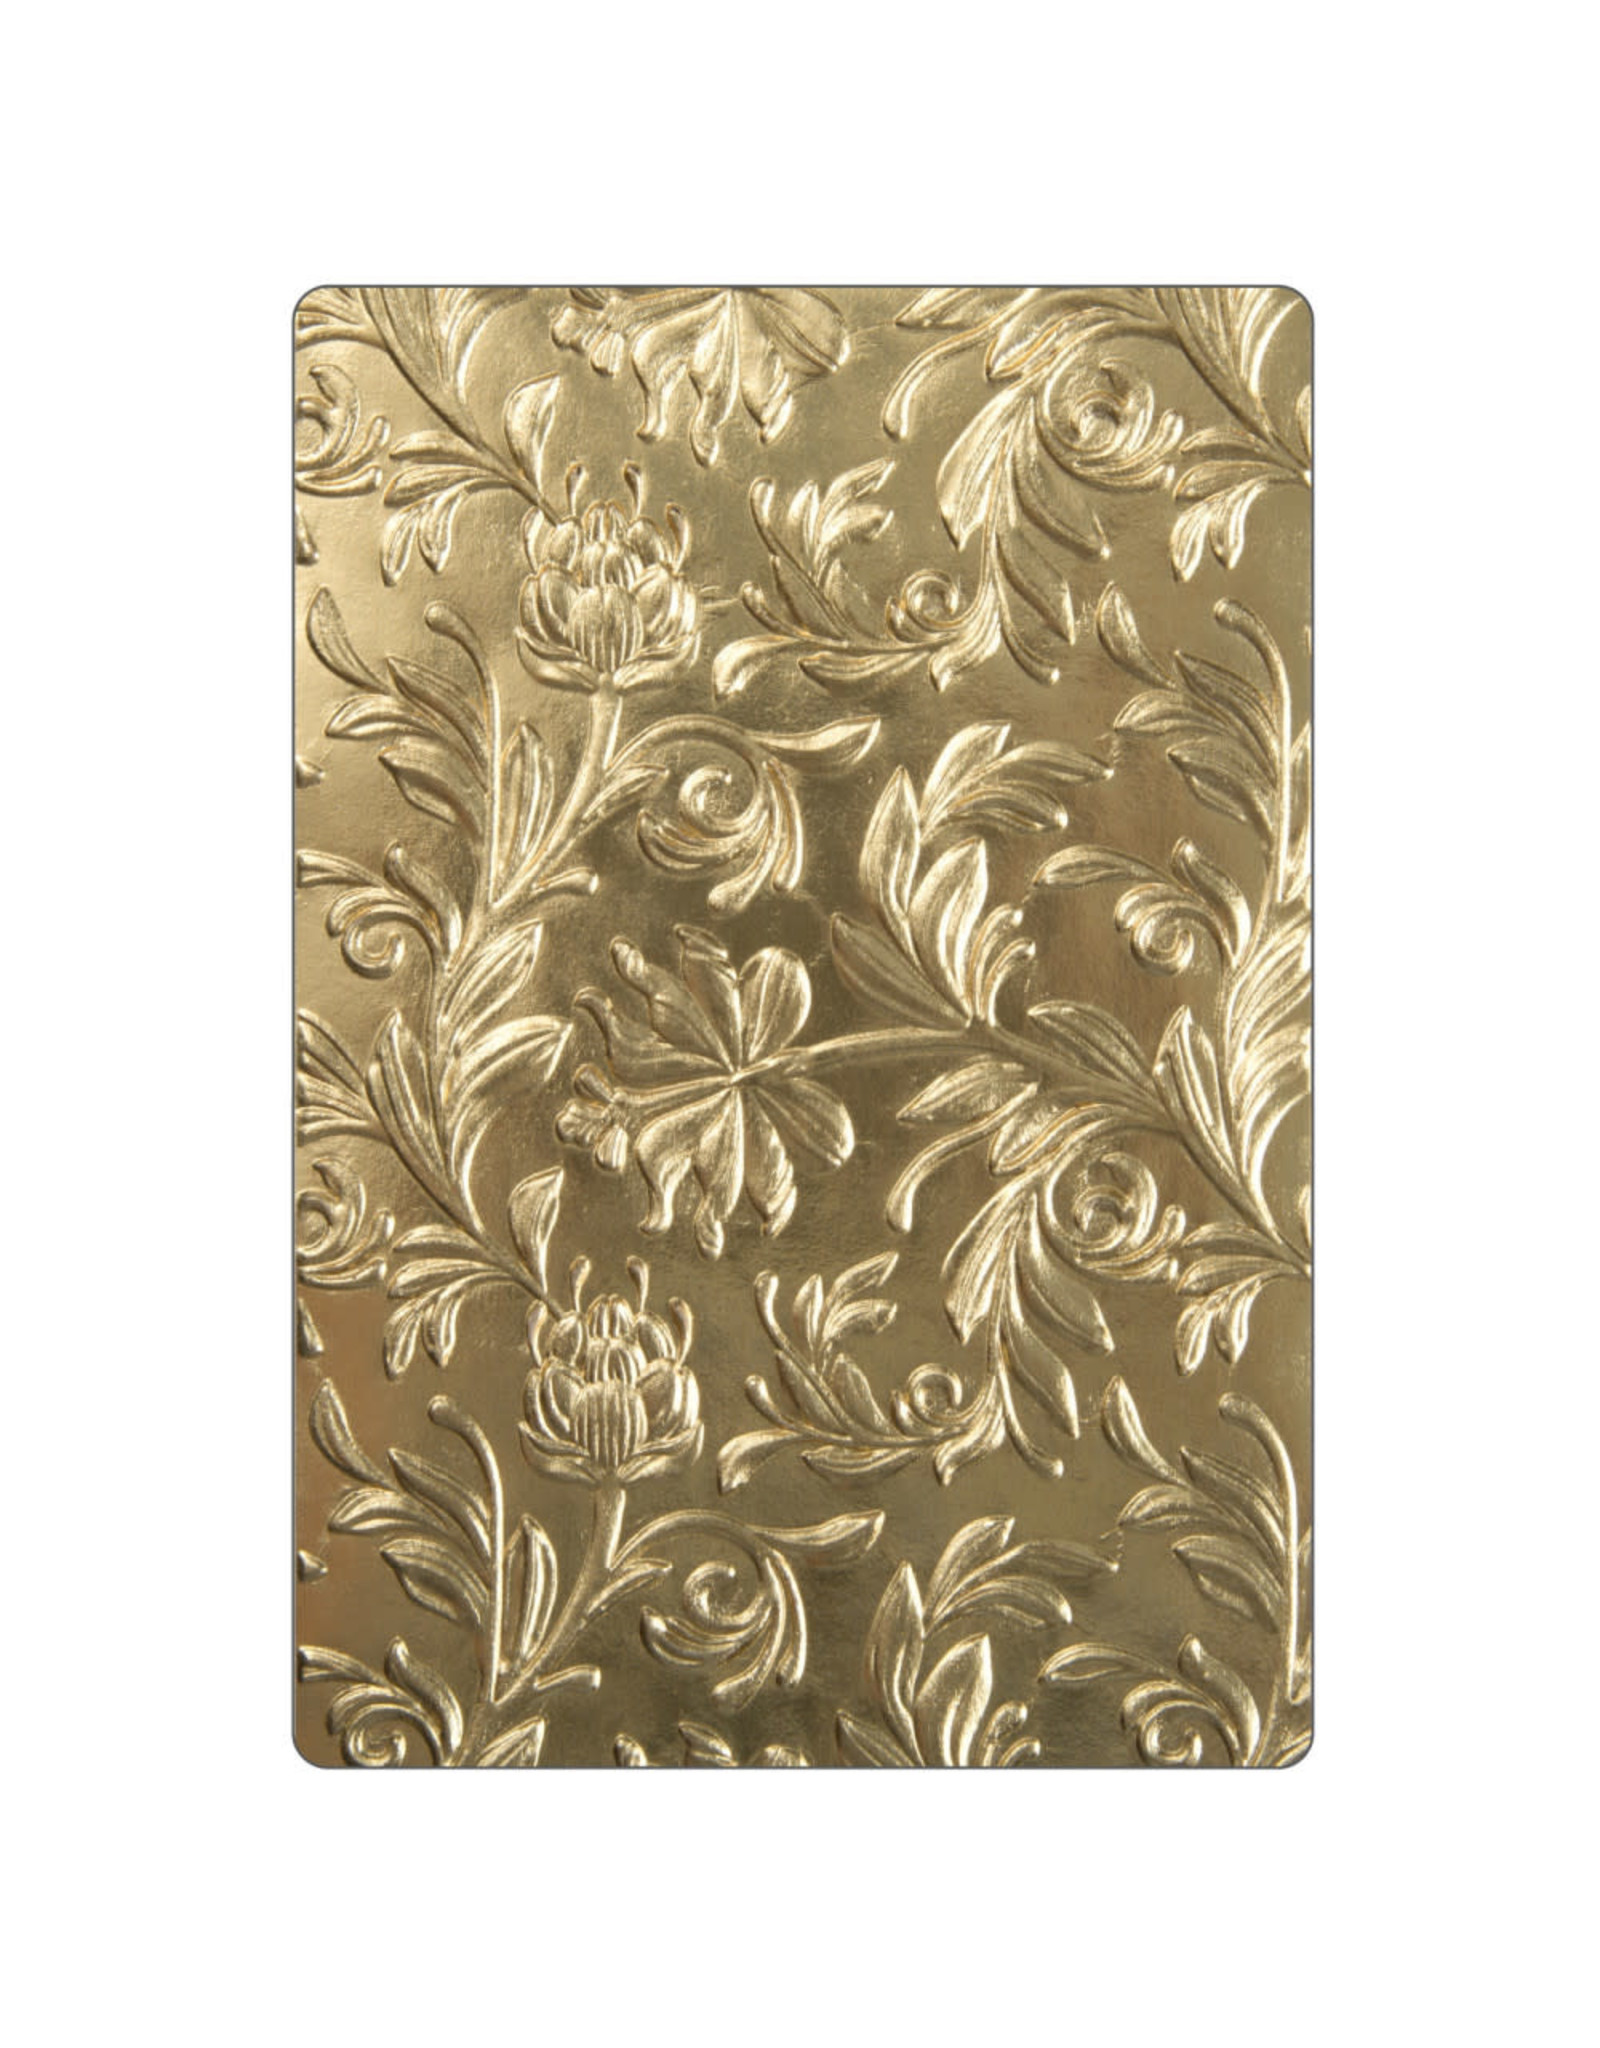 Ellison/Sizzix Botanical - 3D Texture Fades (A6) Embossing Folder